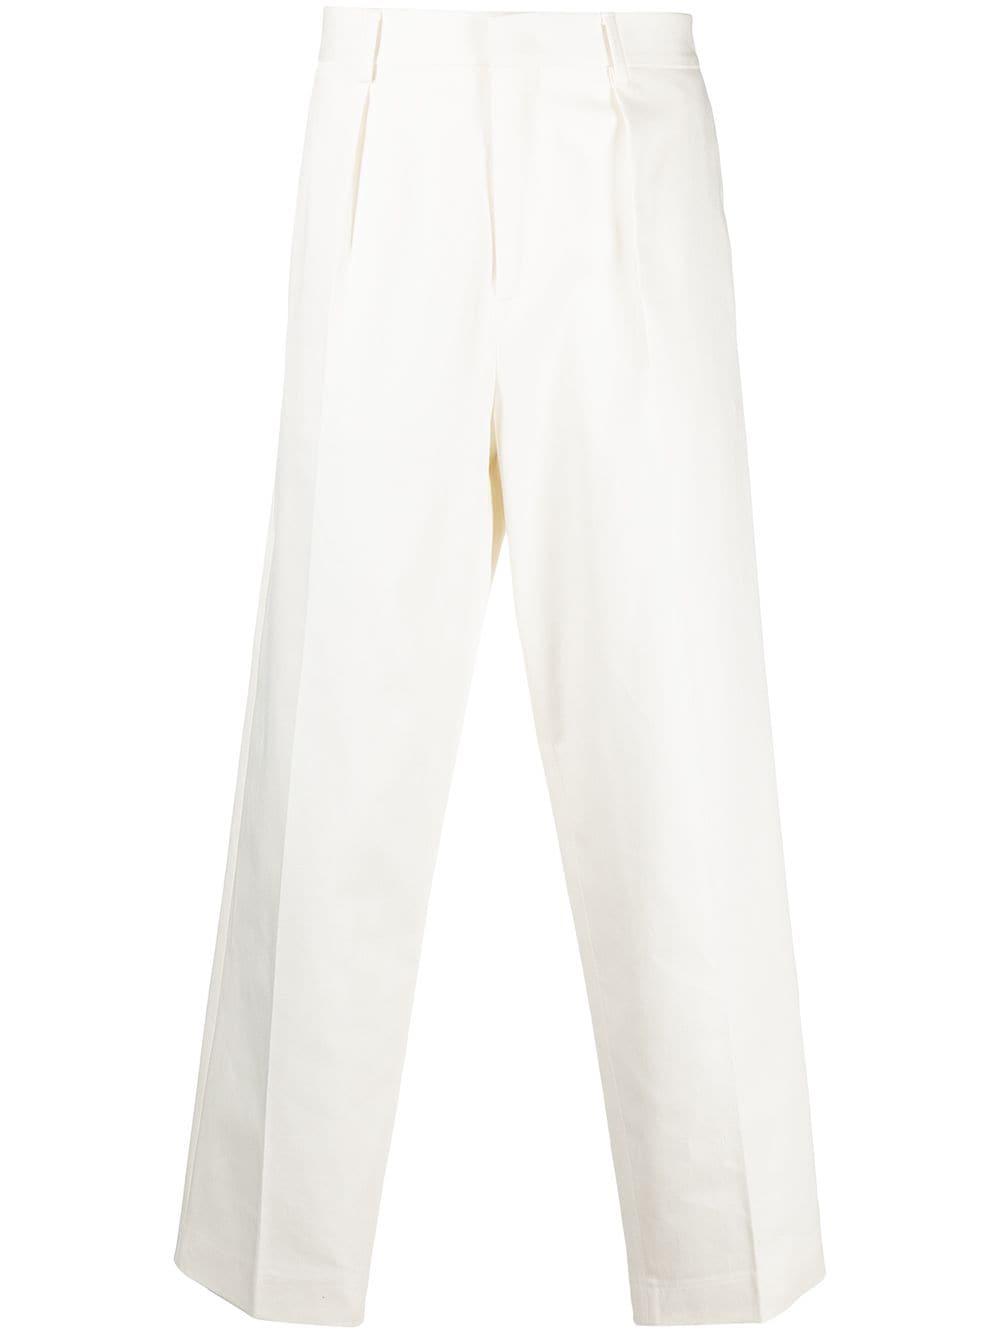 Gcds pantalone d'archivio uomo GCDS | Pantaloni | SS21M03050301